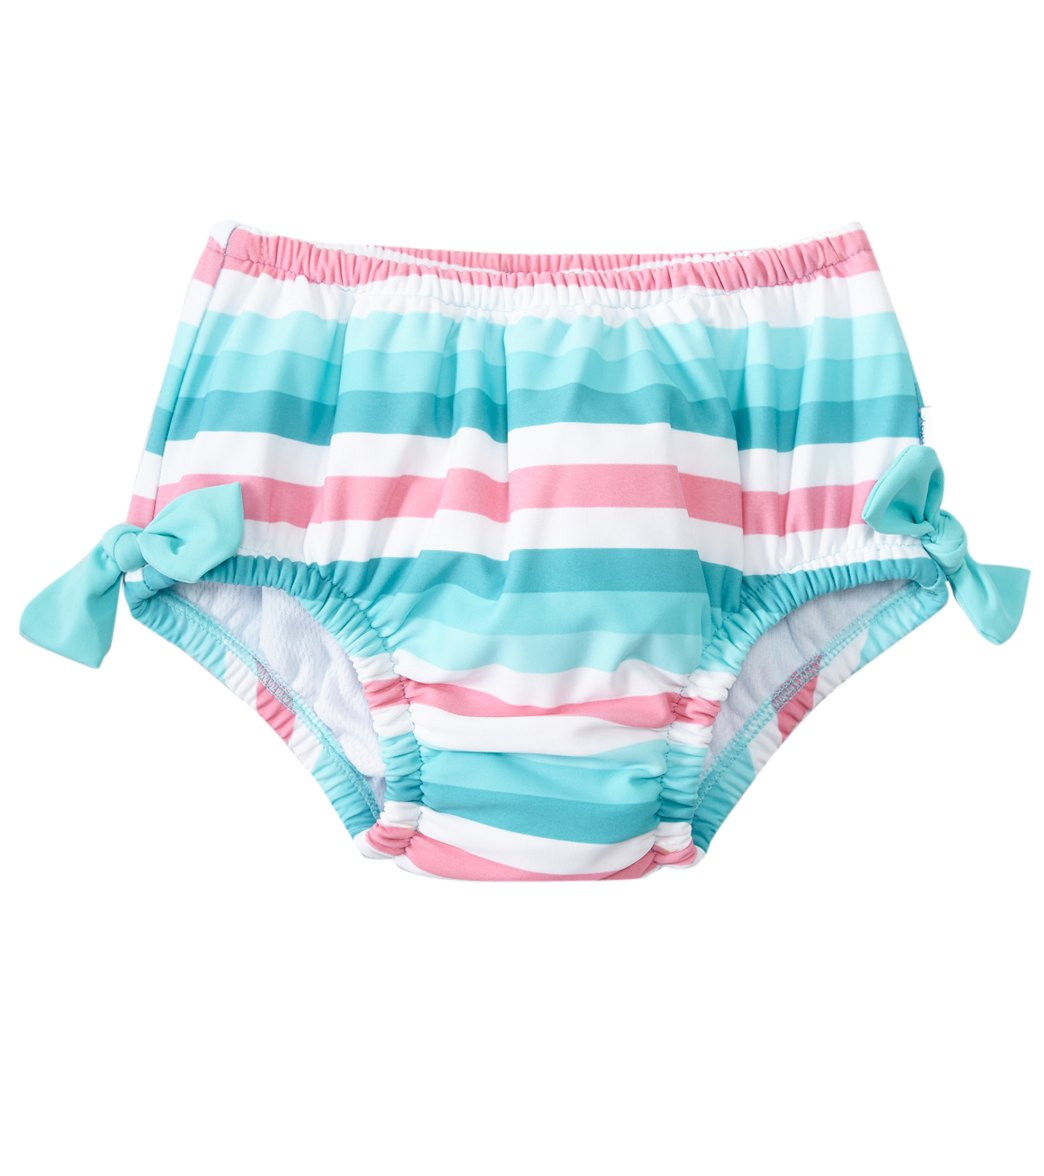 87a9d06642 iPlay Girls' Classic Bow Swimsuit Bottom w/Built-in Swim Diaper (Baby